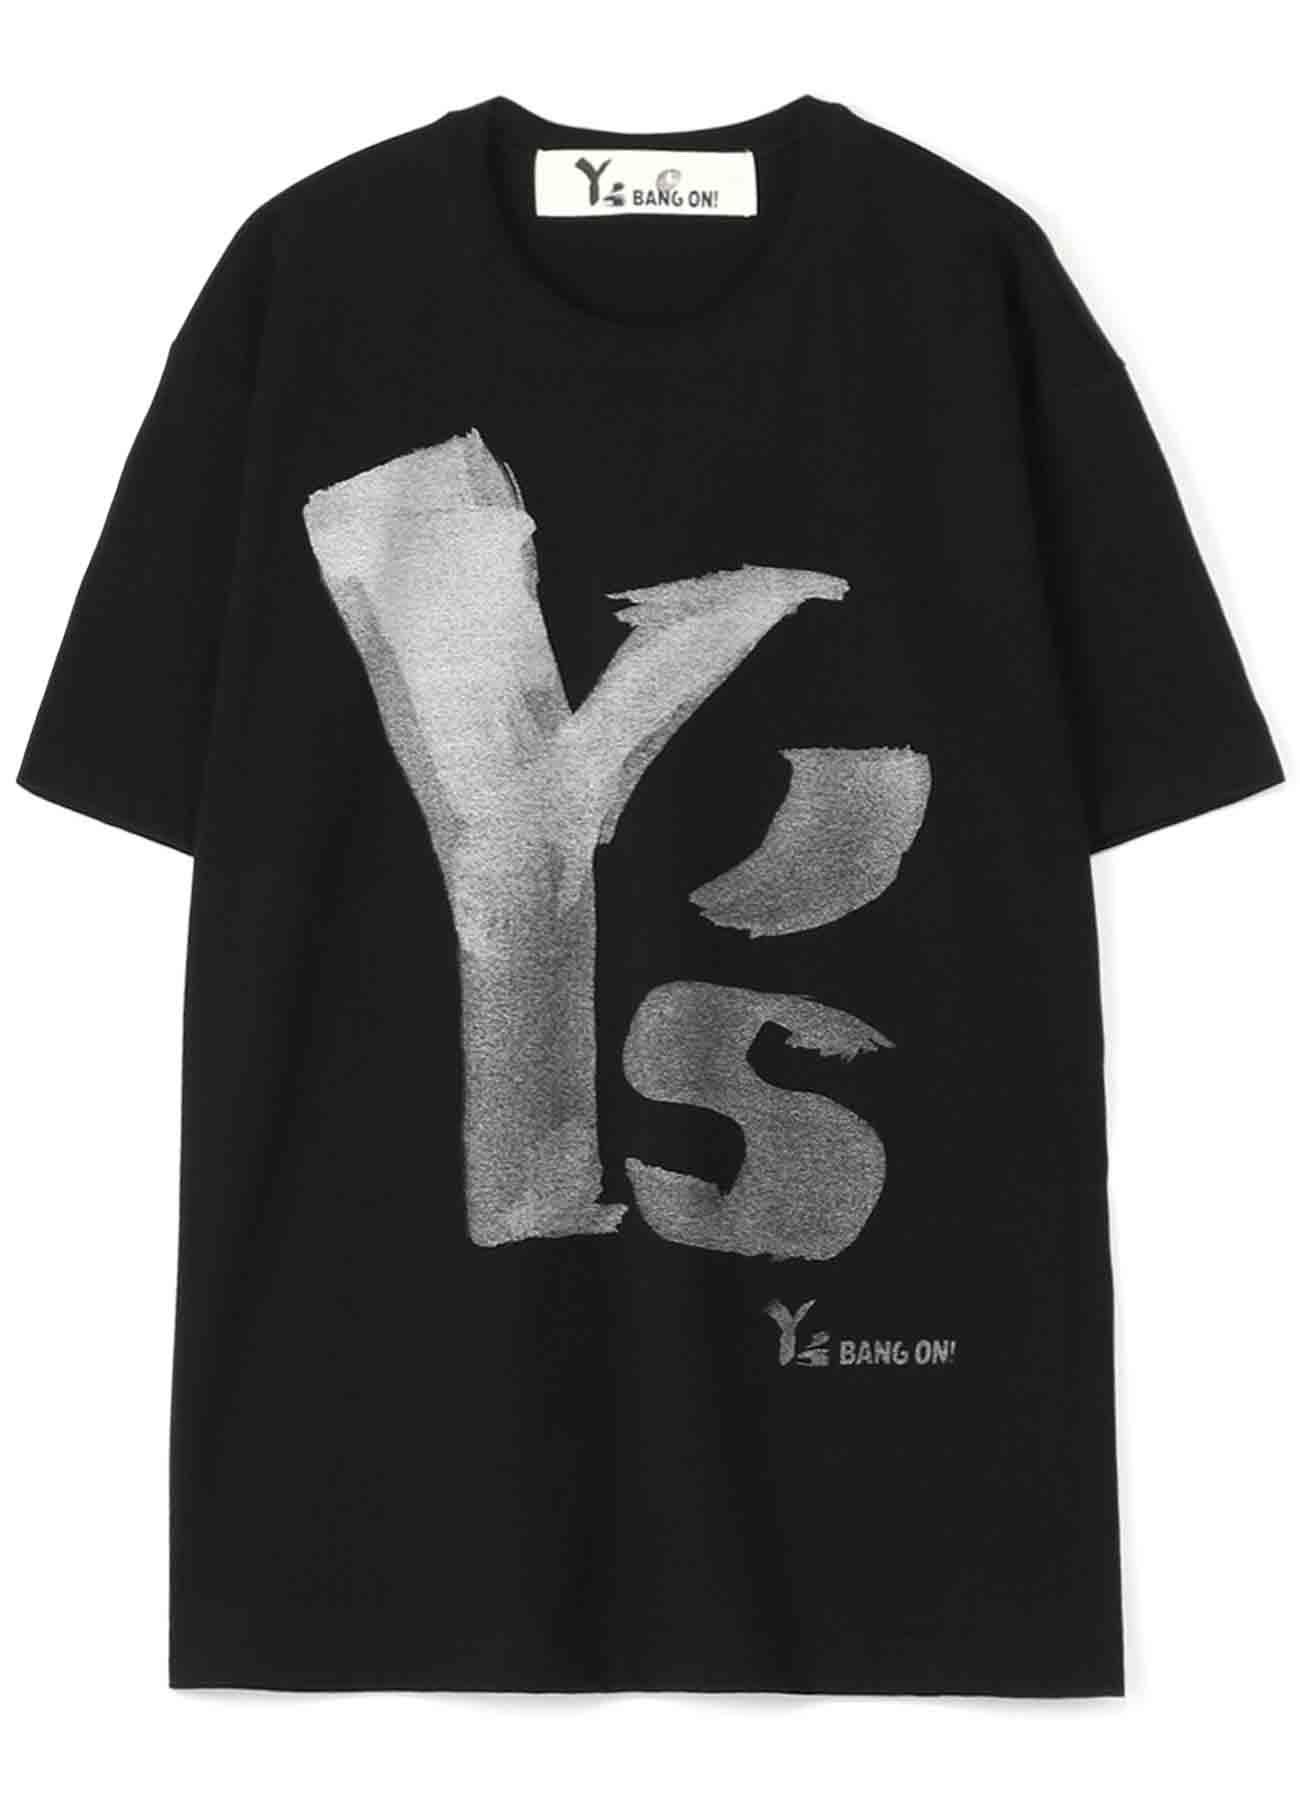 Y's BANG ON!デカロゴTシャツ シルバー半袖